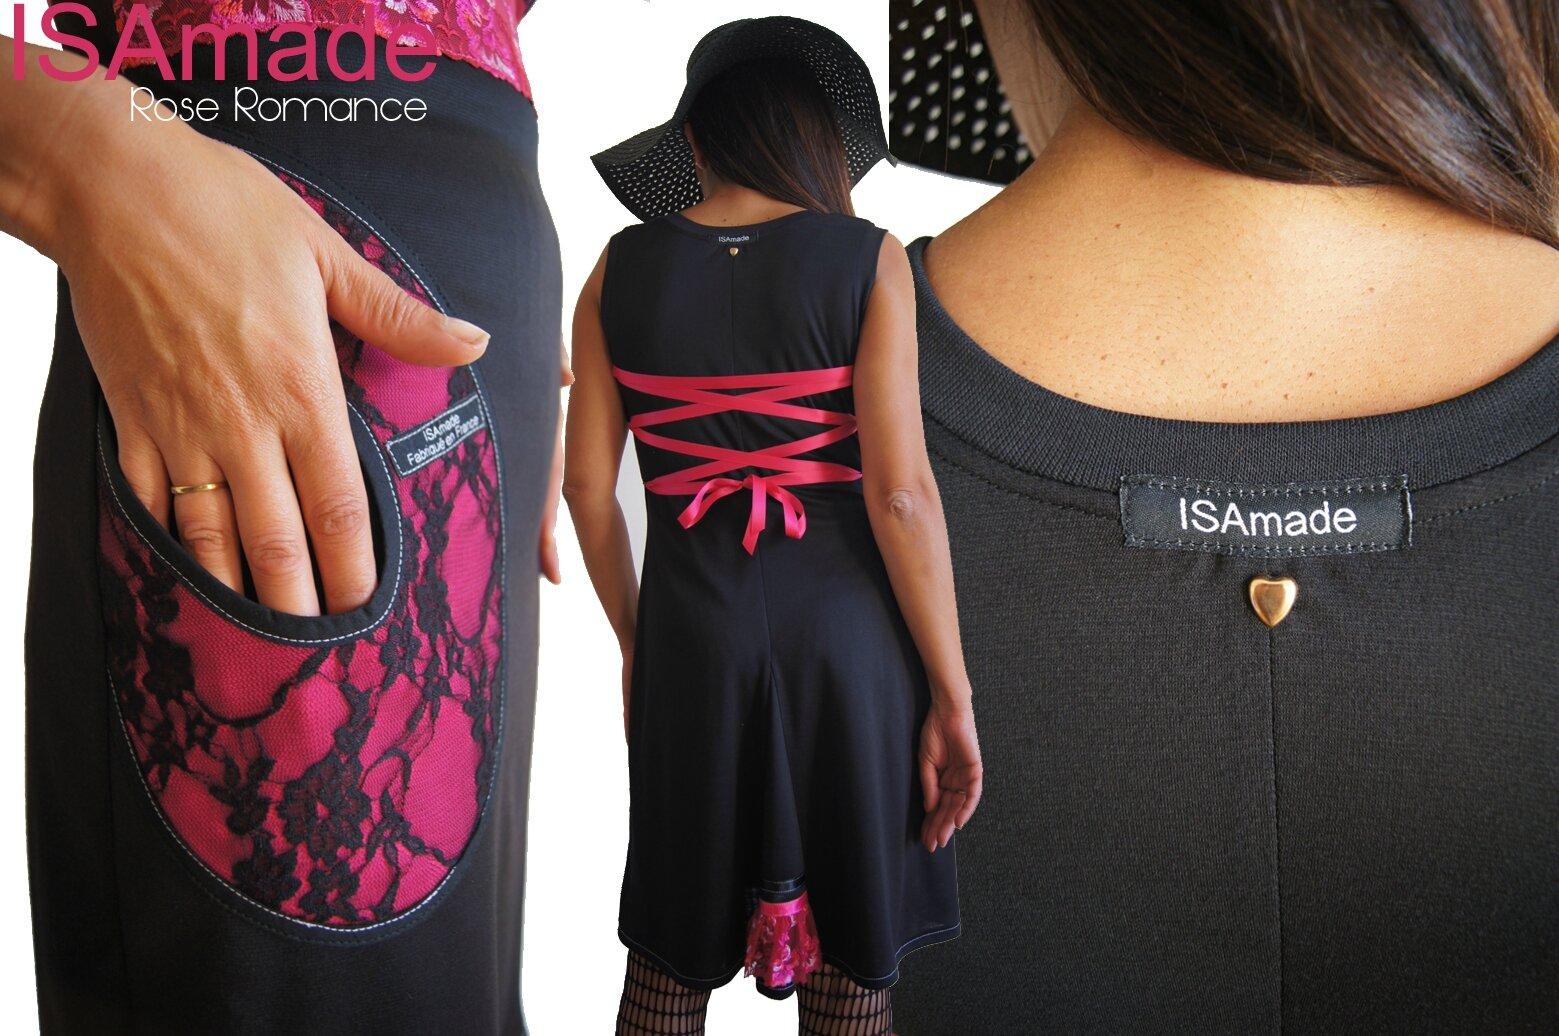 Robe Dentelle laçage Dos fantaisie Bicolore Graphique Noir/Fuchsia femme